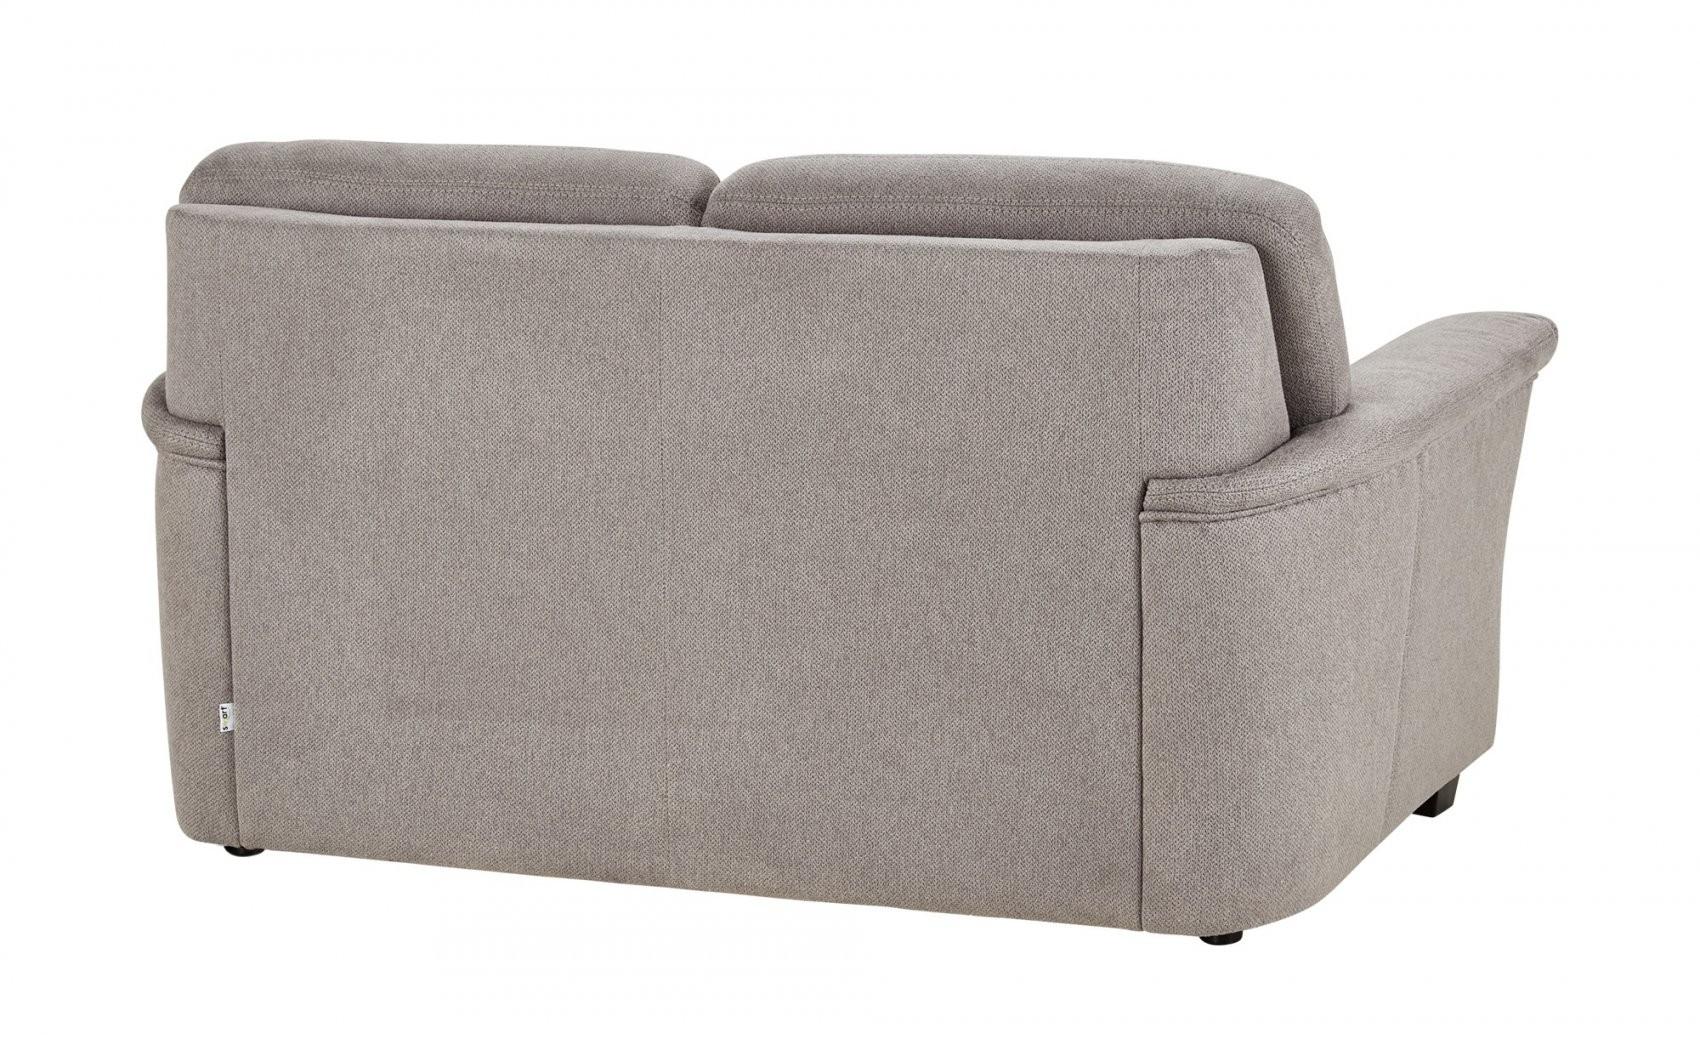 Smart Sofa Grau  Flachgewebe Valencia  Grau 2Sitzer von Sofa 2 Sitzer Billig Bild